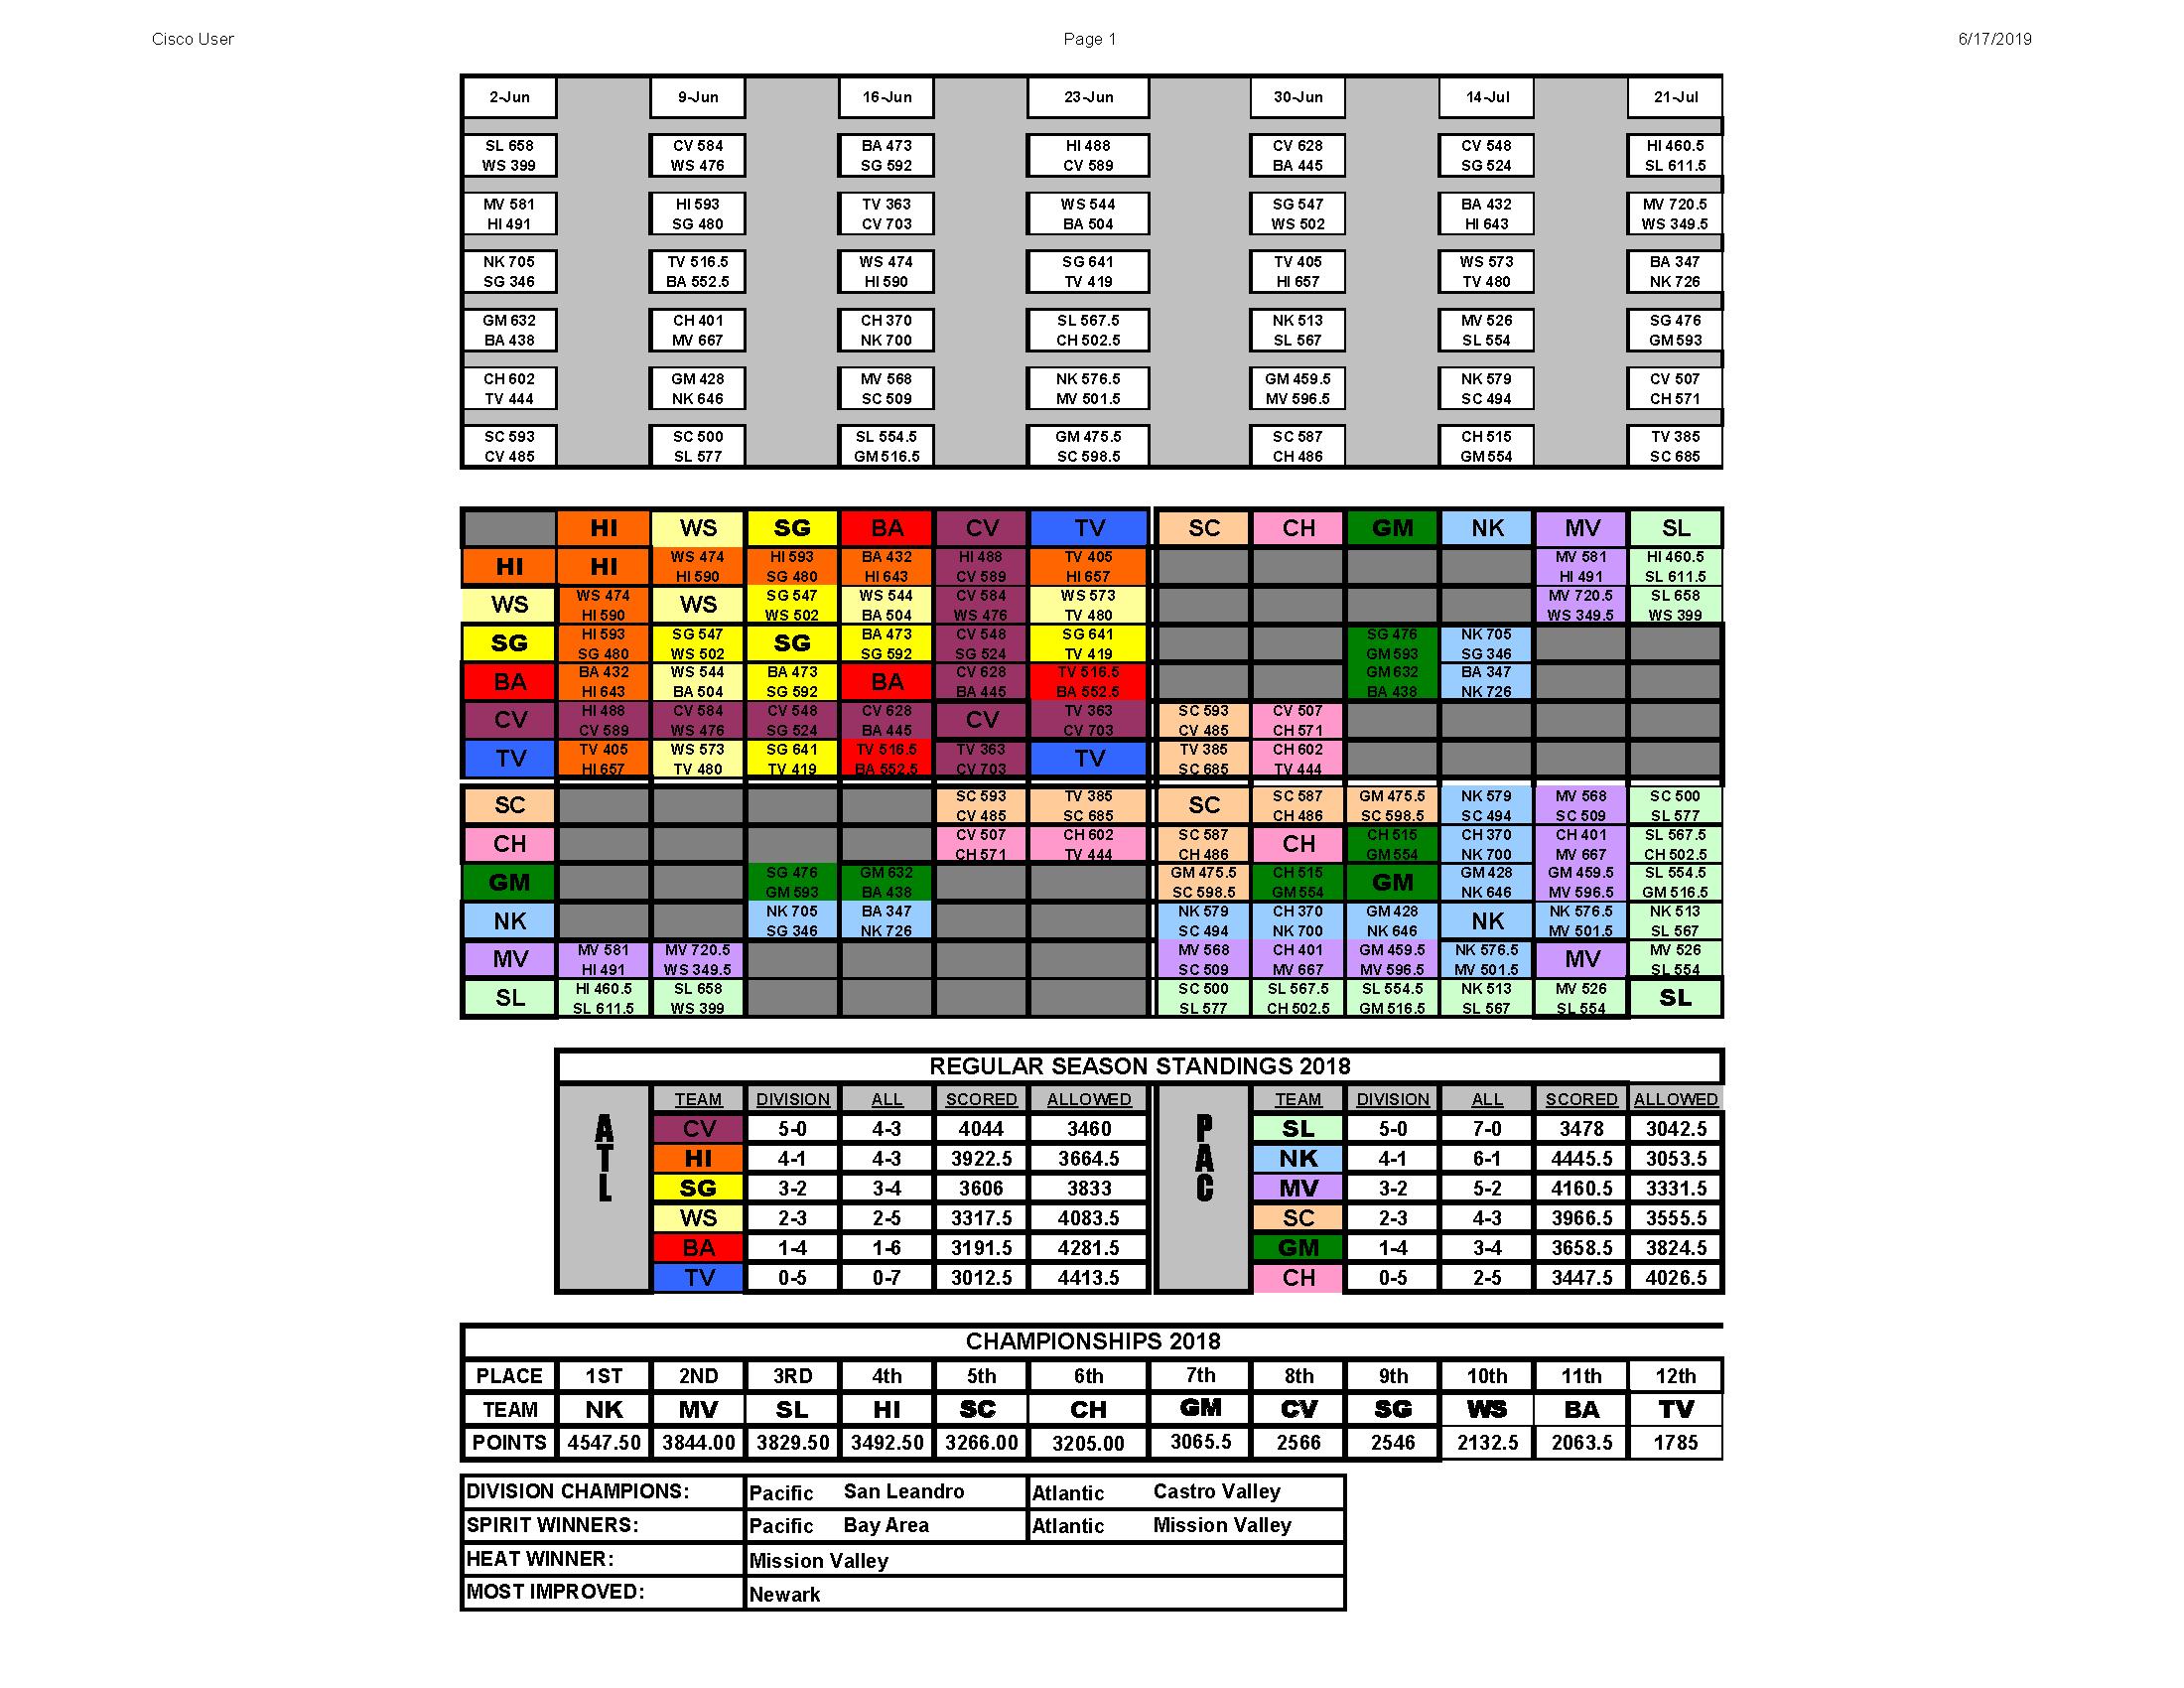 dual-meet-2018